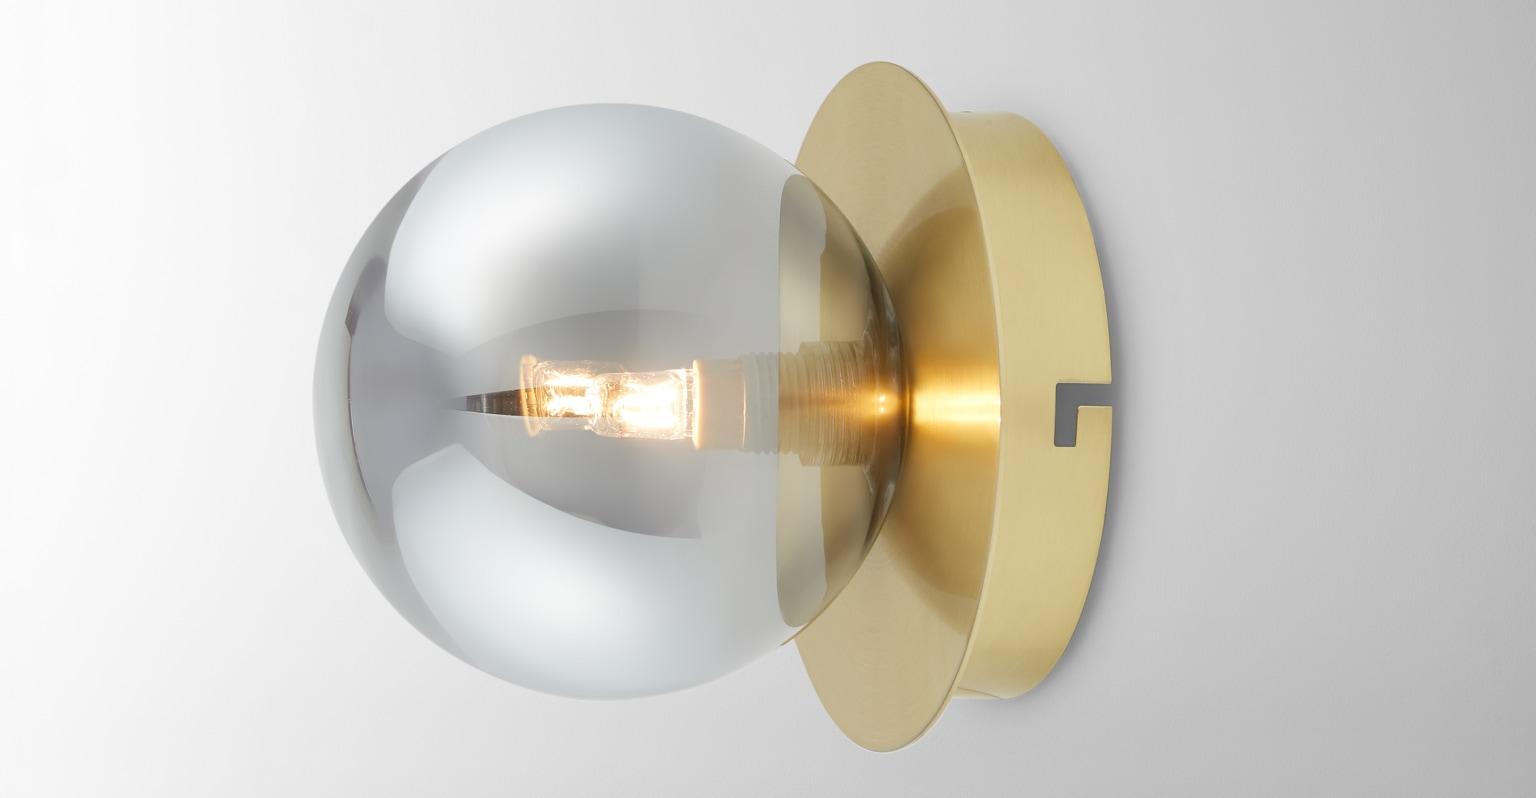 Boll Lámpara de pared Boll, latón y cristal ahumado